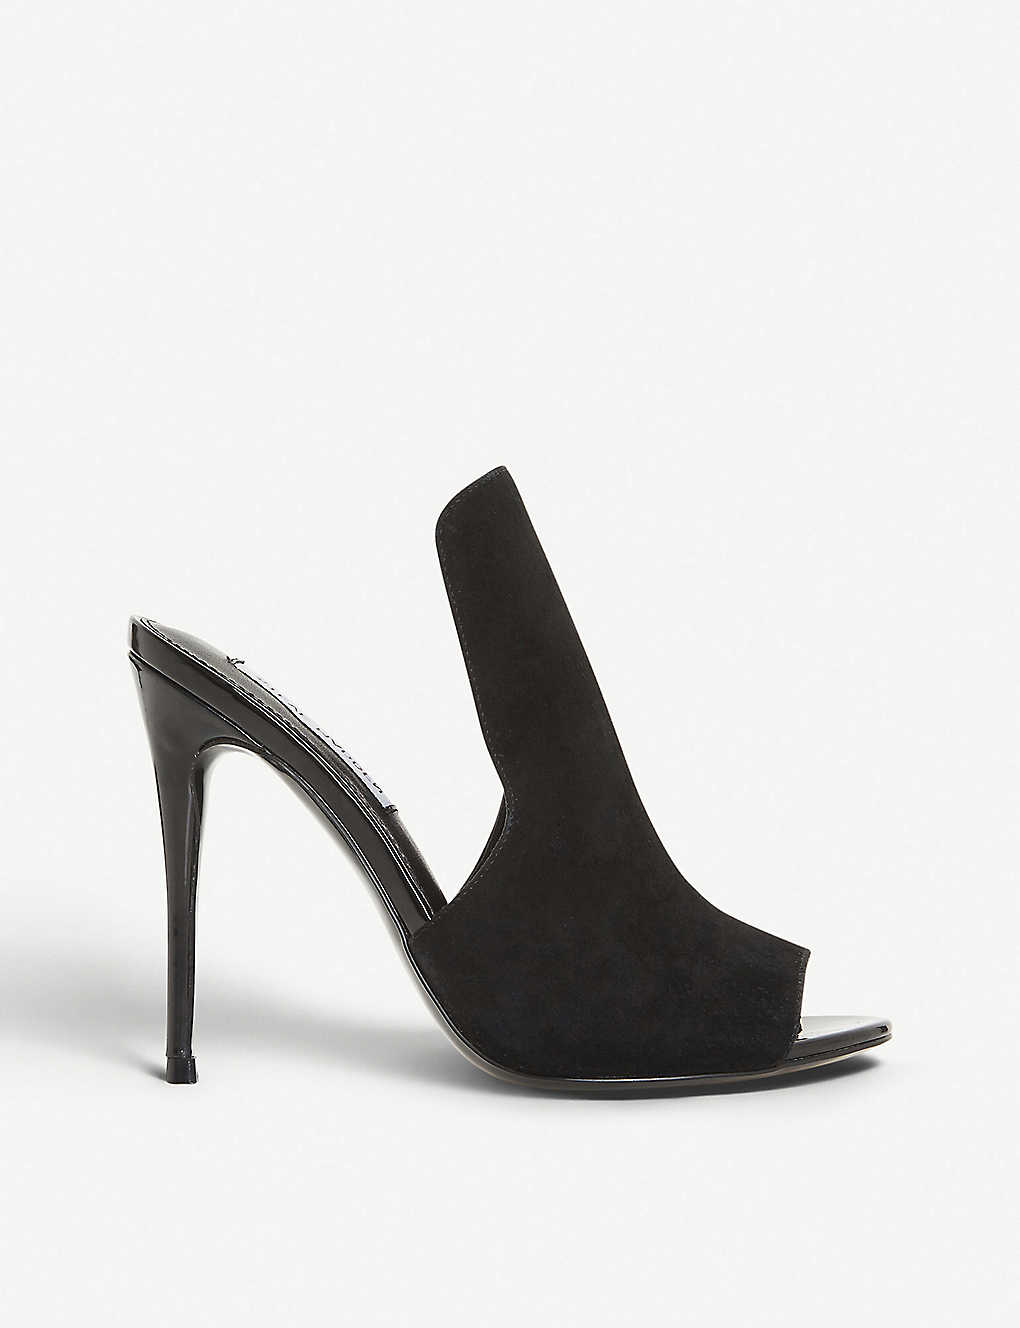 7381102ab1 STEVE MADDEN - Sinful high-vamp suede heeled mules | Selfridges.com